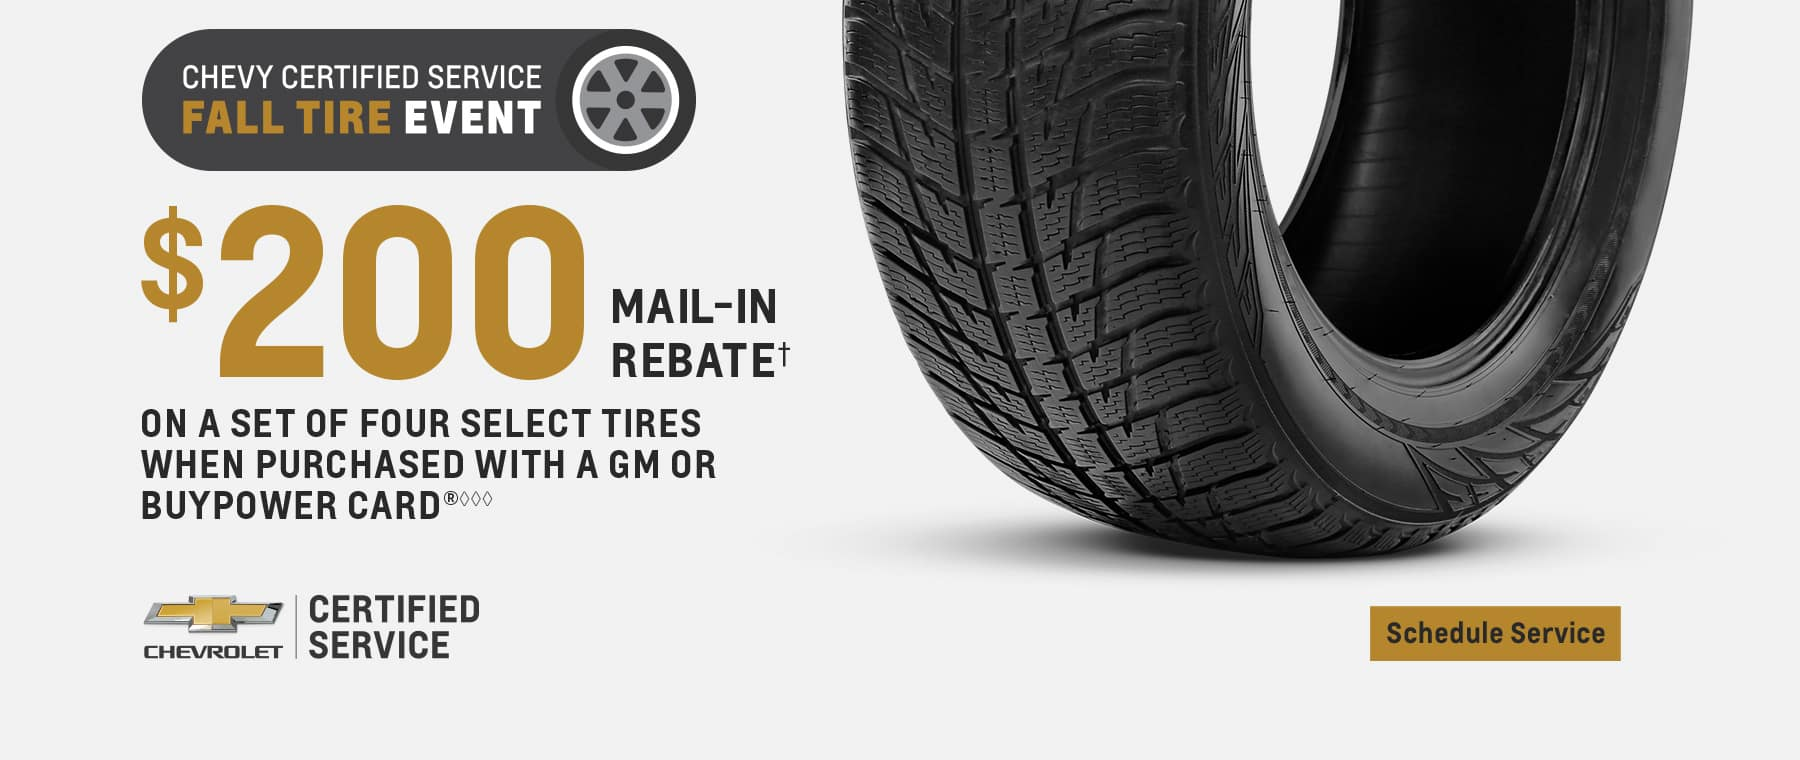 Fall Tire Event - $200 mail in rebate